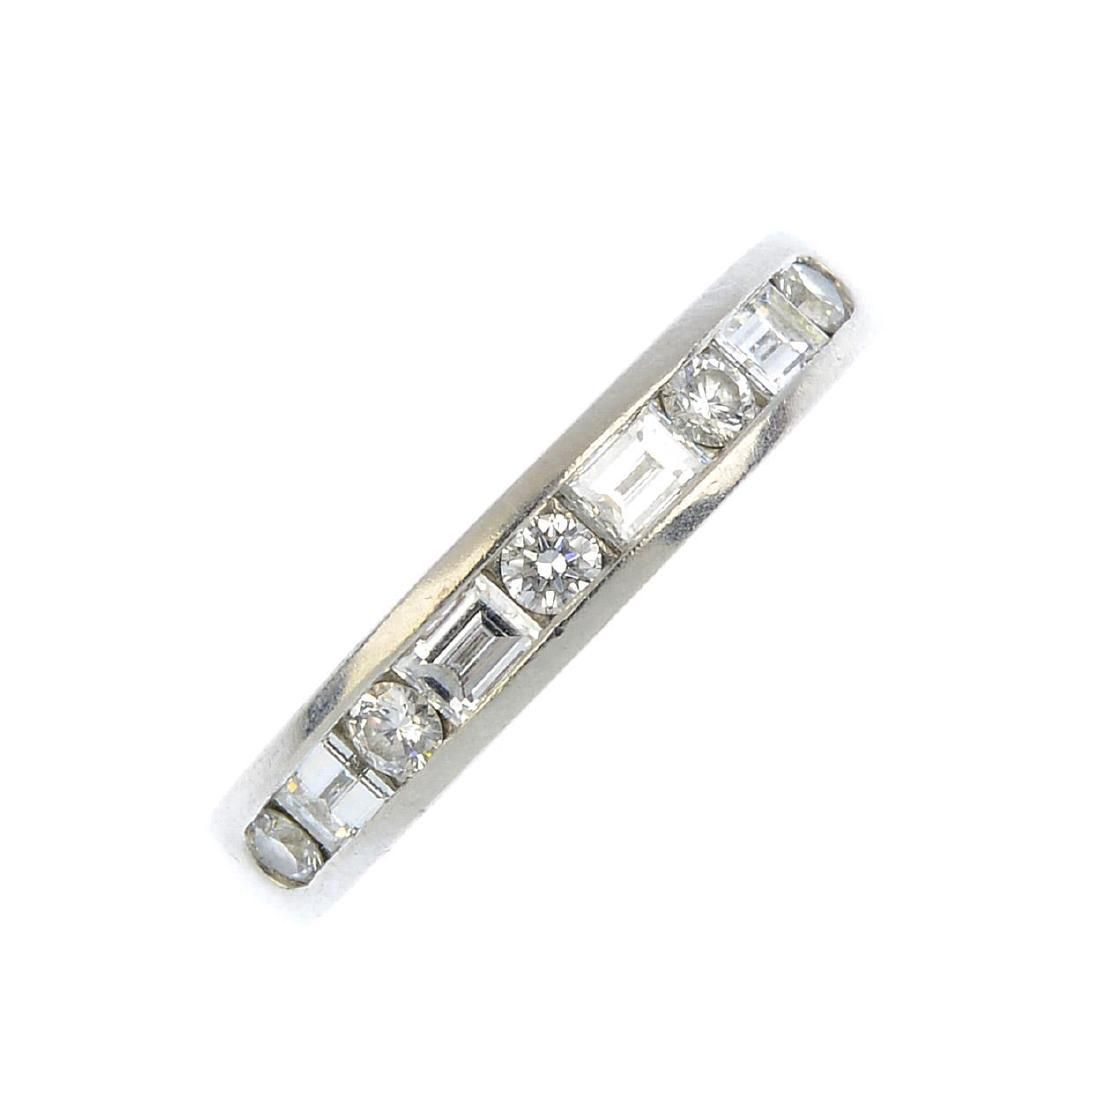 TIFFANY & CO. - a diamond half eternity ring. The